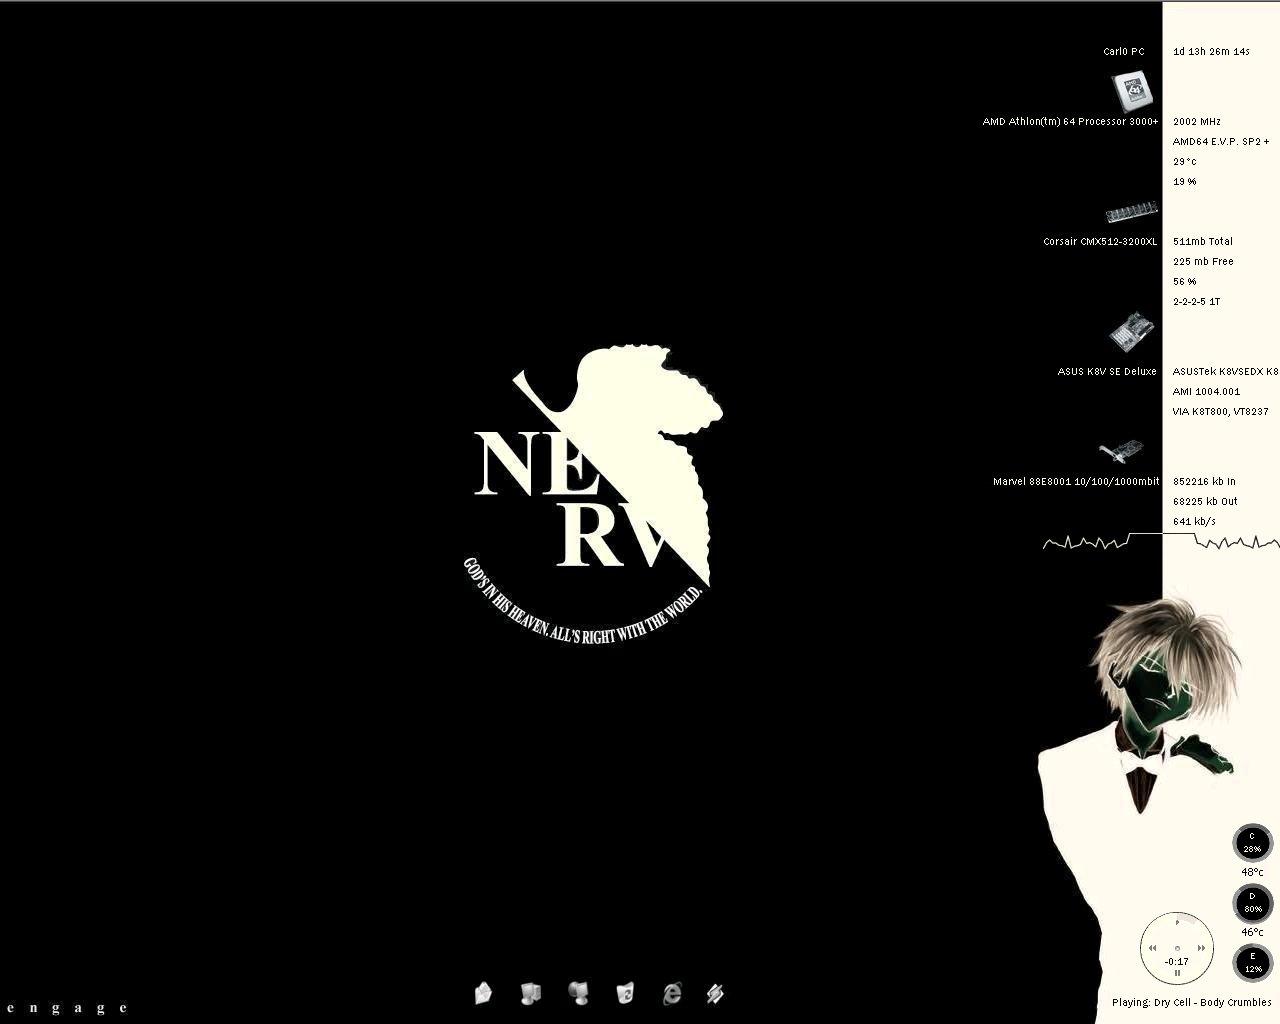 Title: NERV